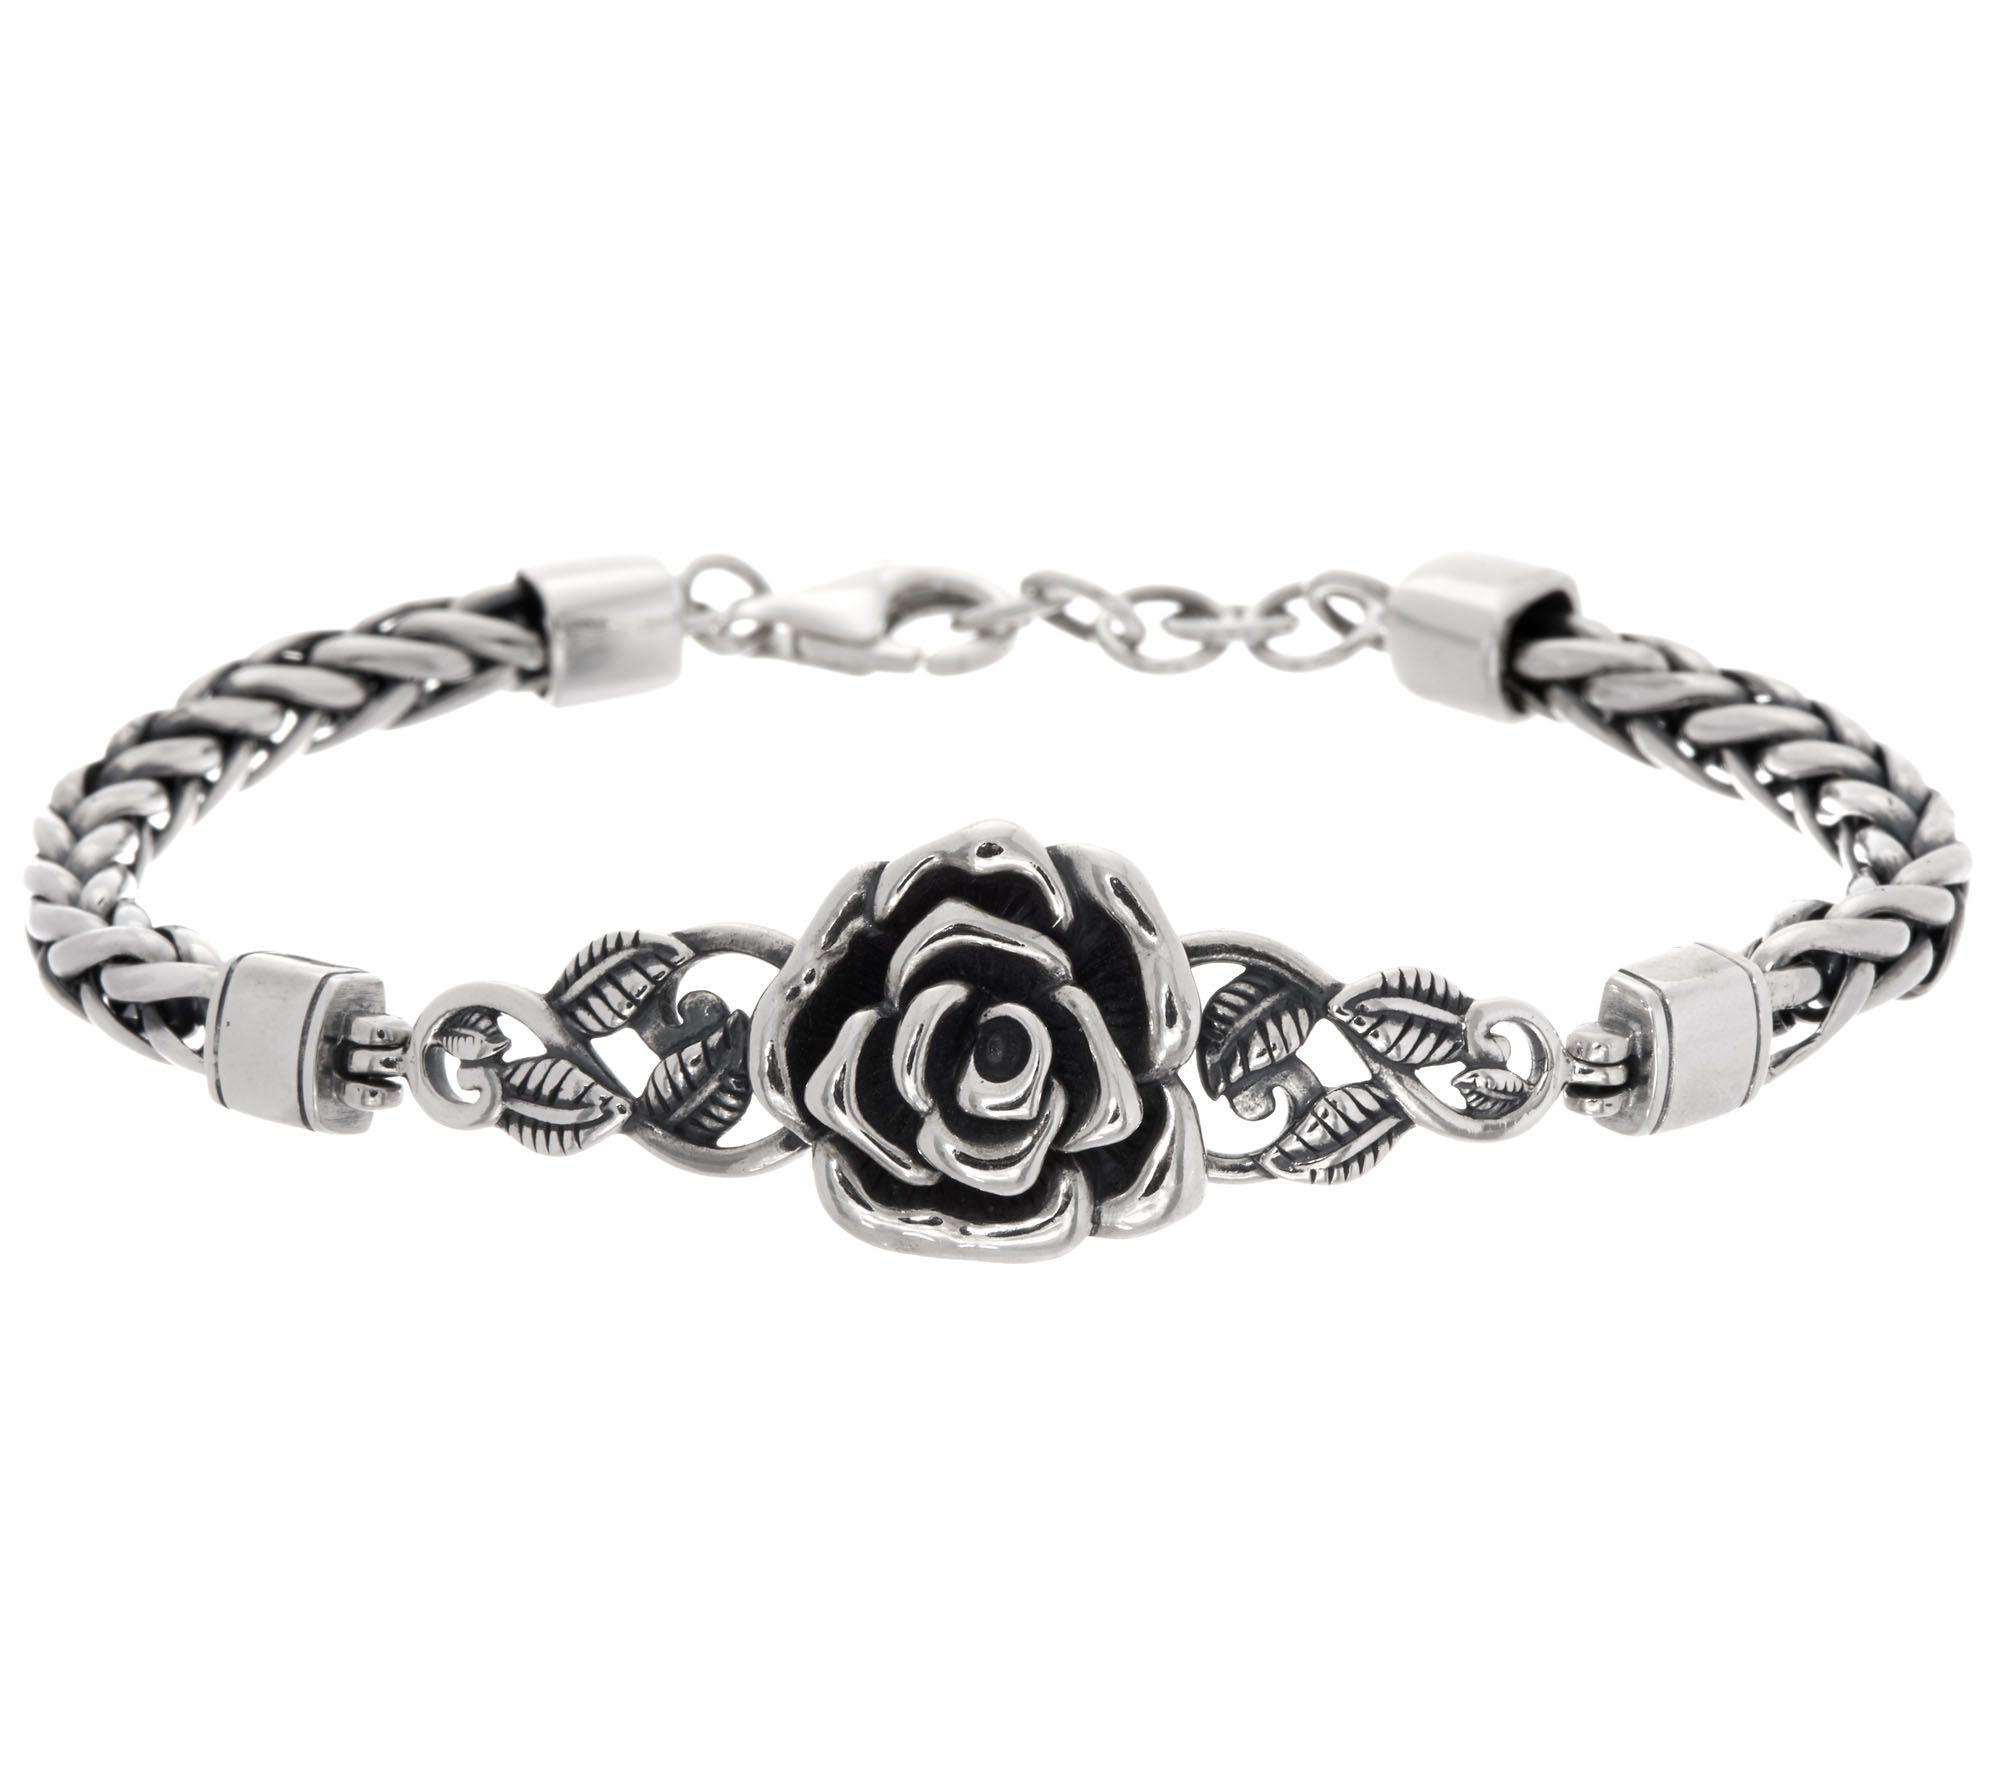 Jewelry Black And Silver Style Guru Fashion Glitz